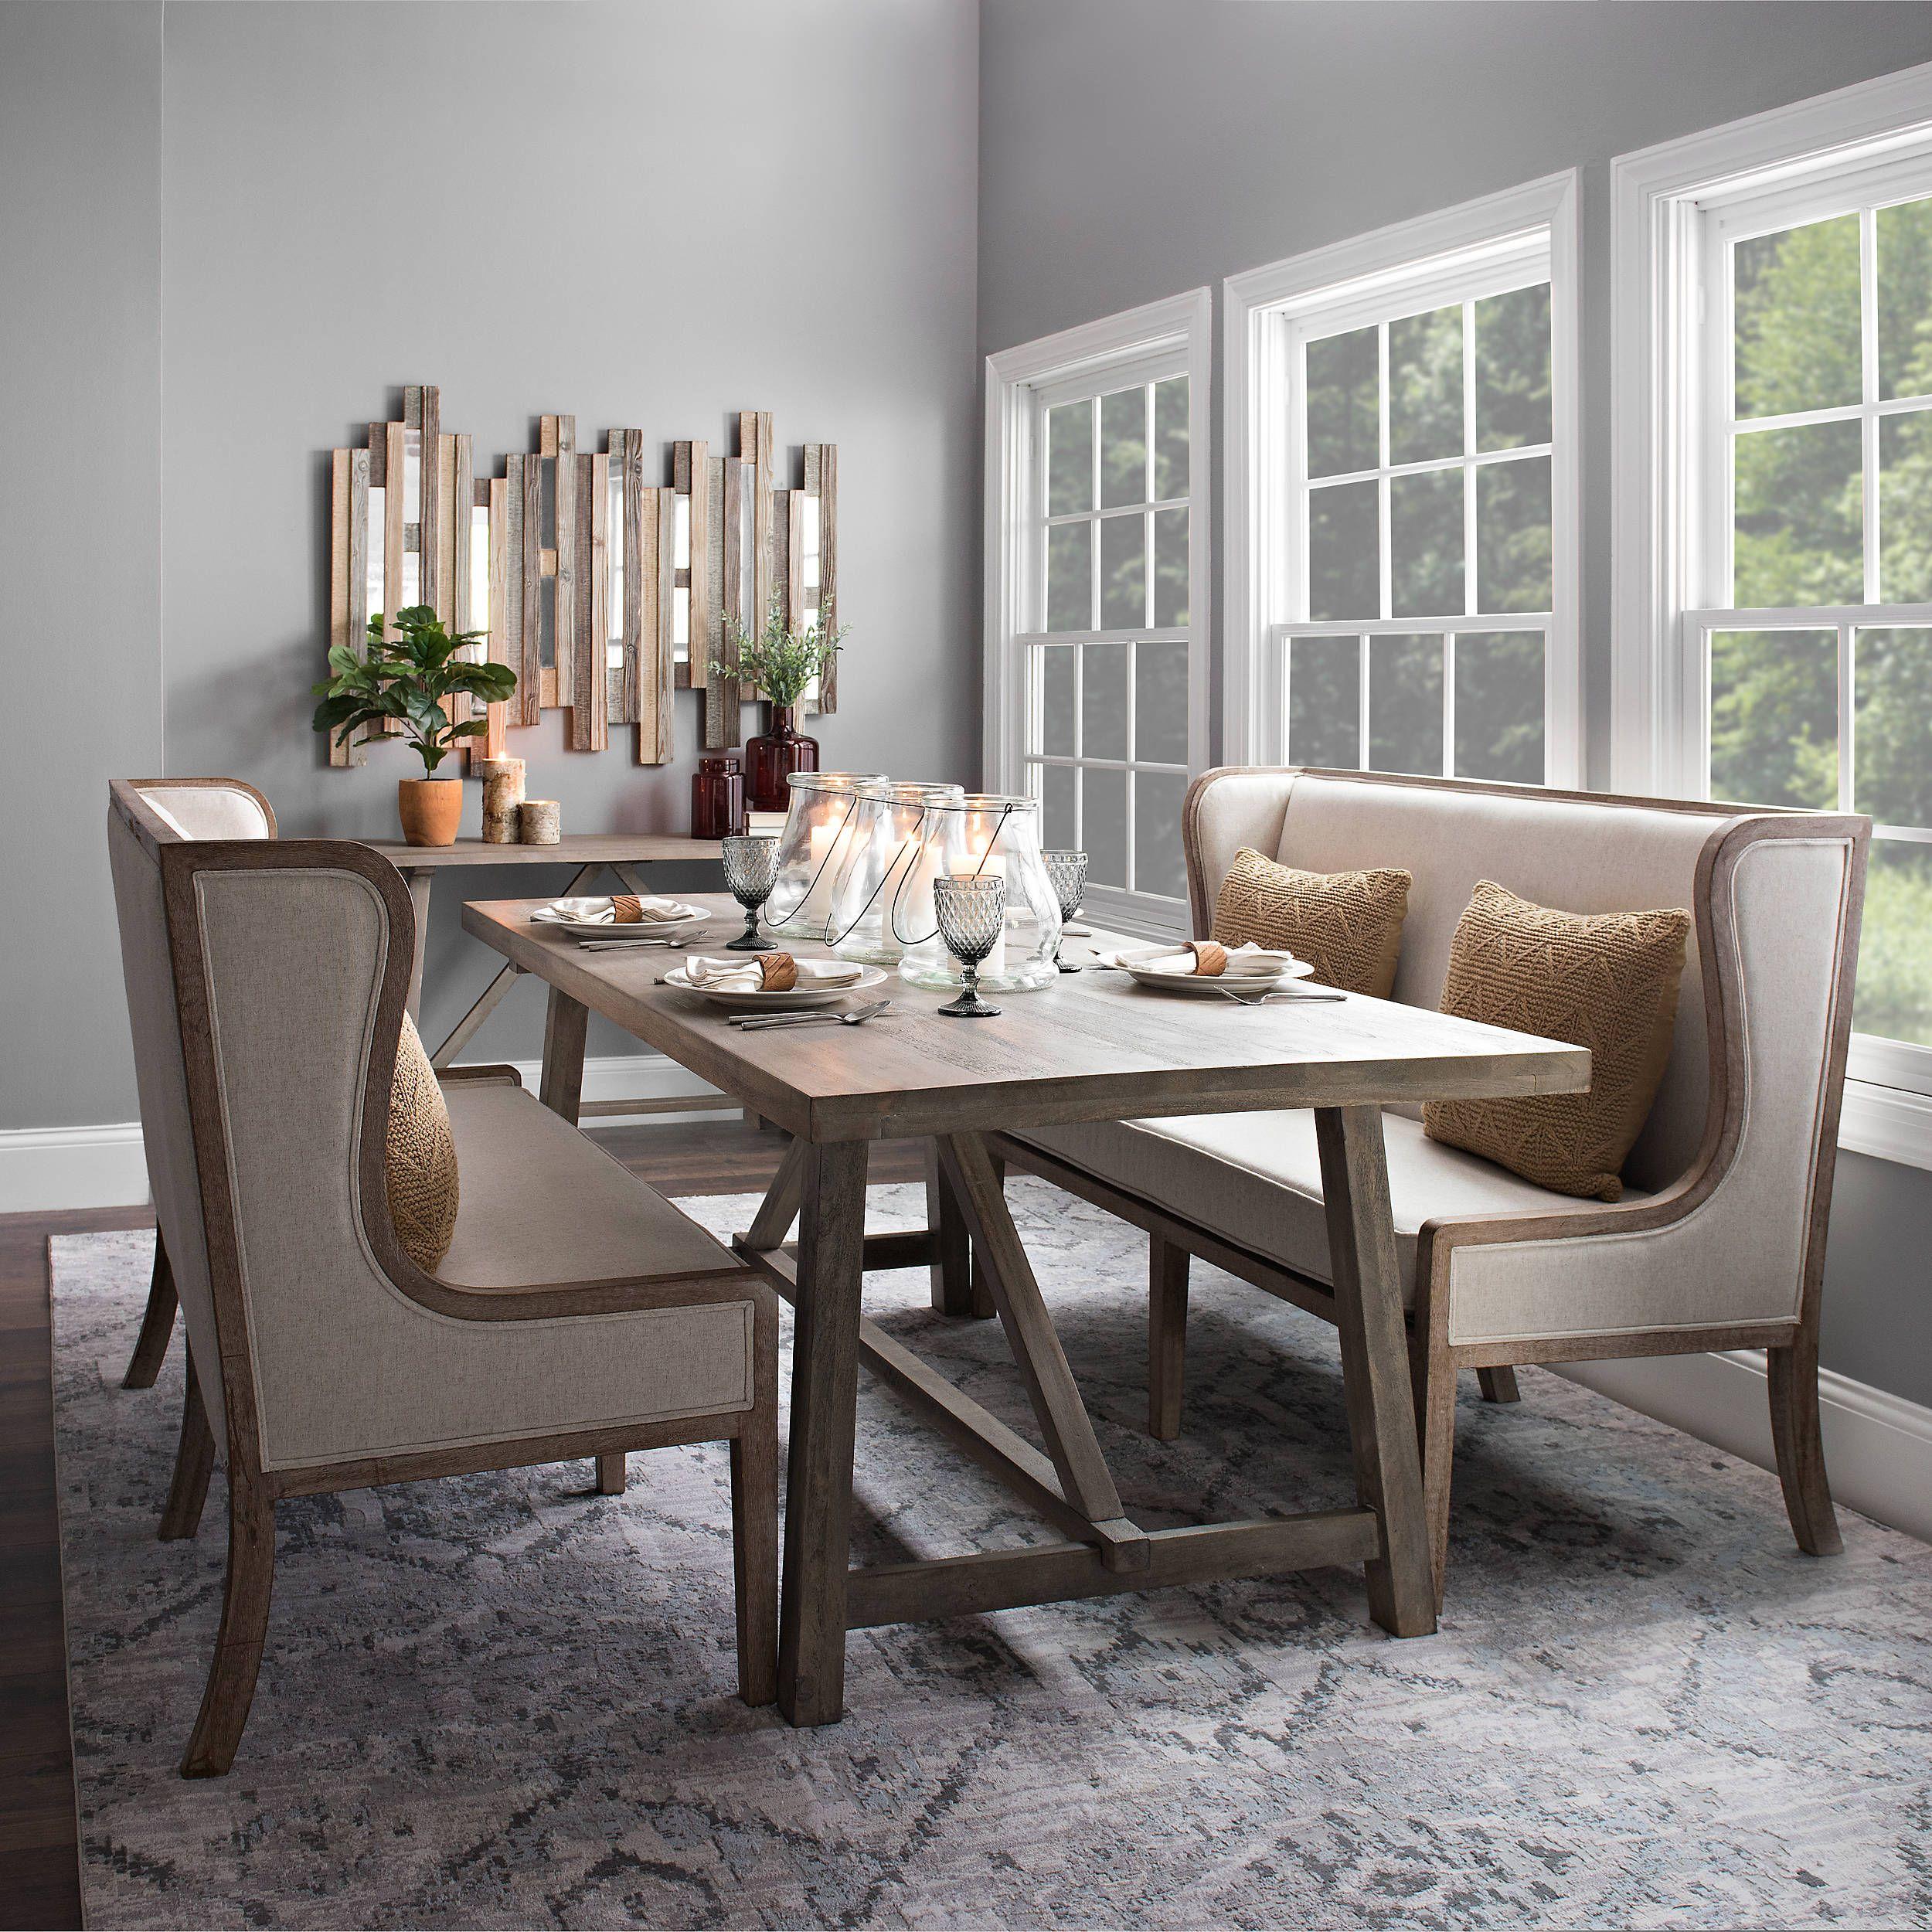 Farmhouse Dining Table In 2020 Dining Table Farmhouse Dining